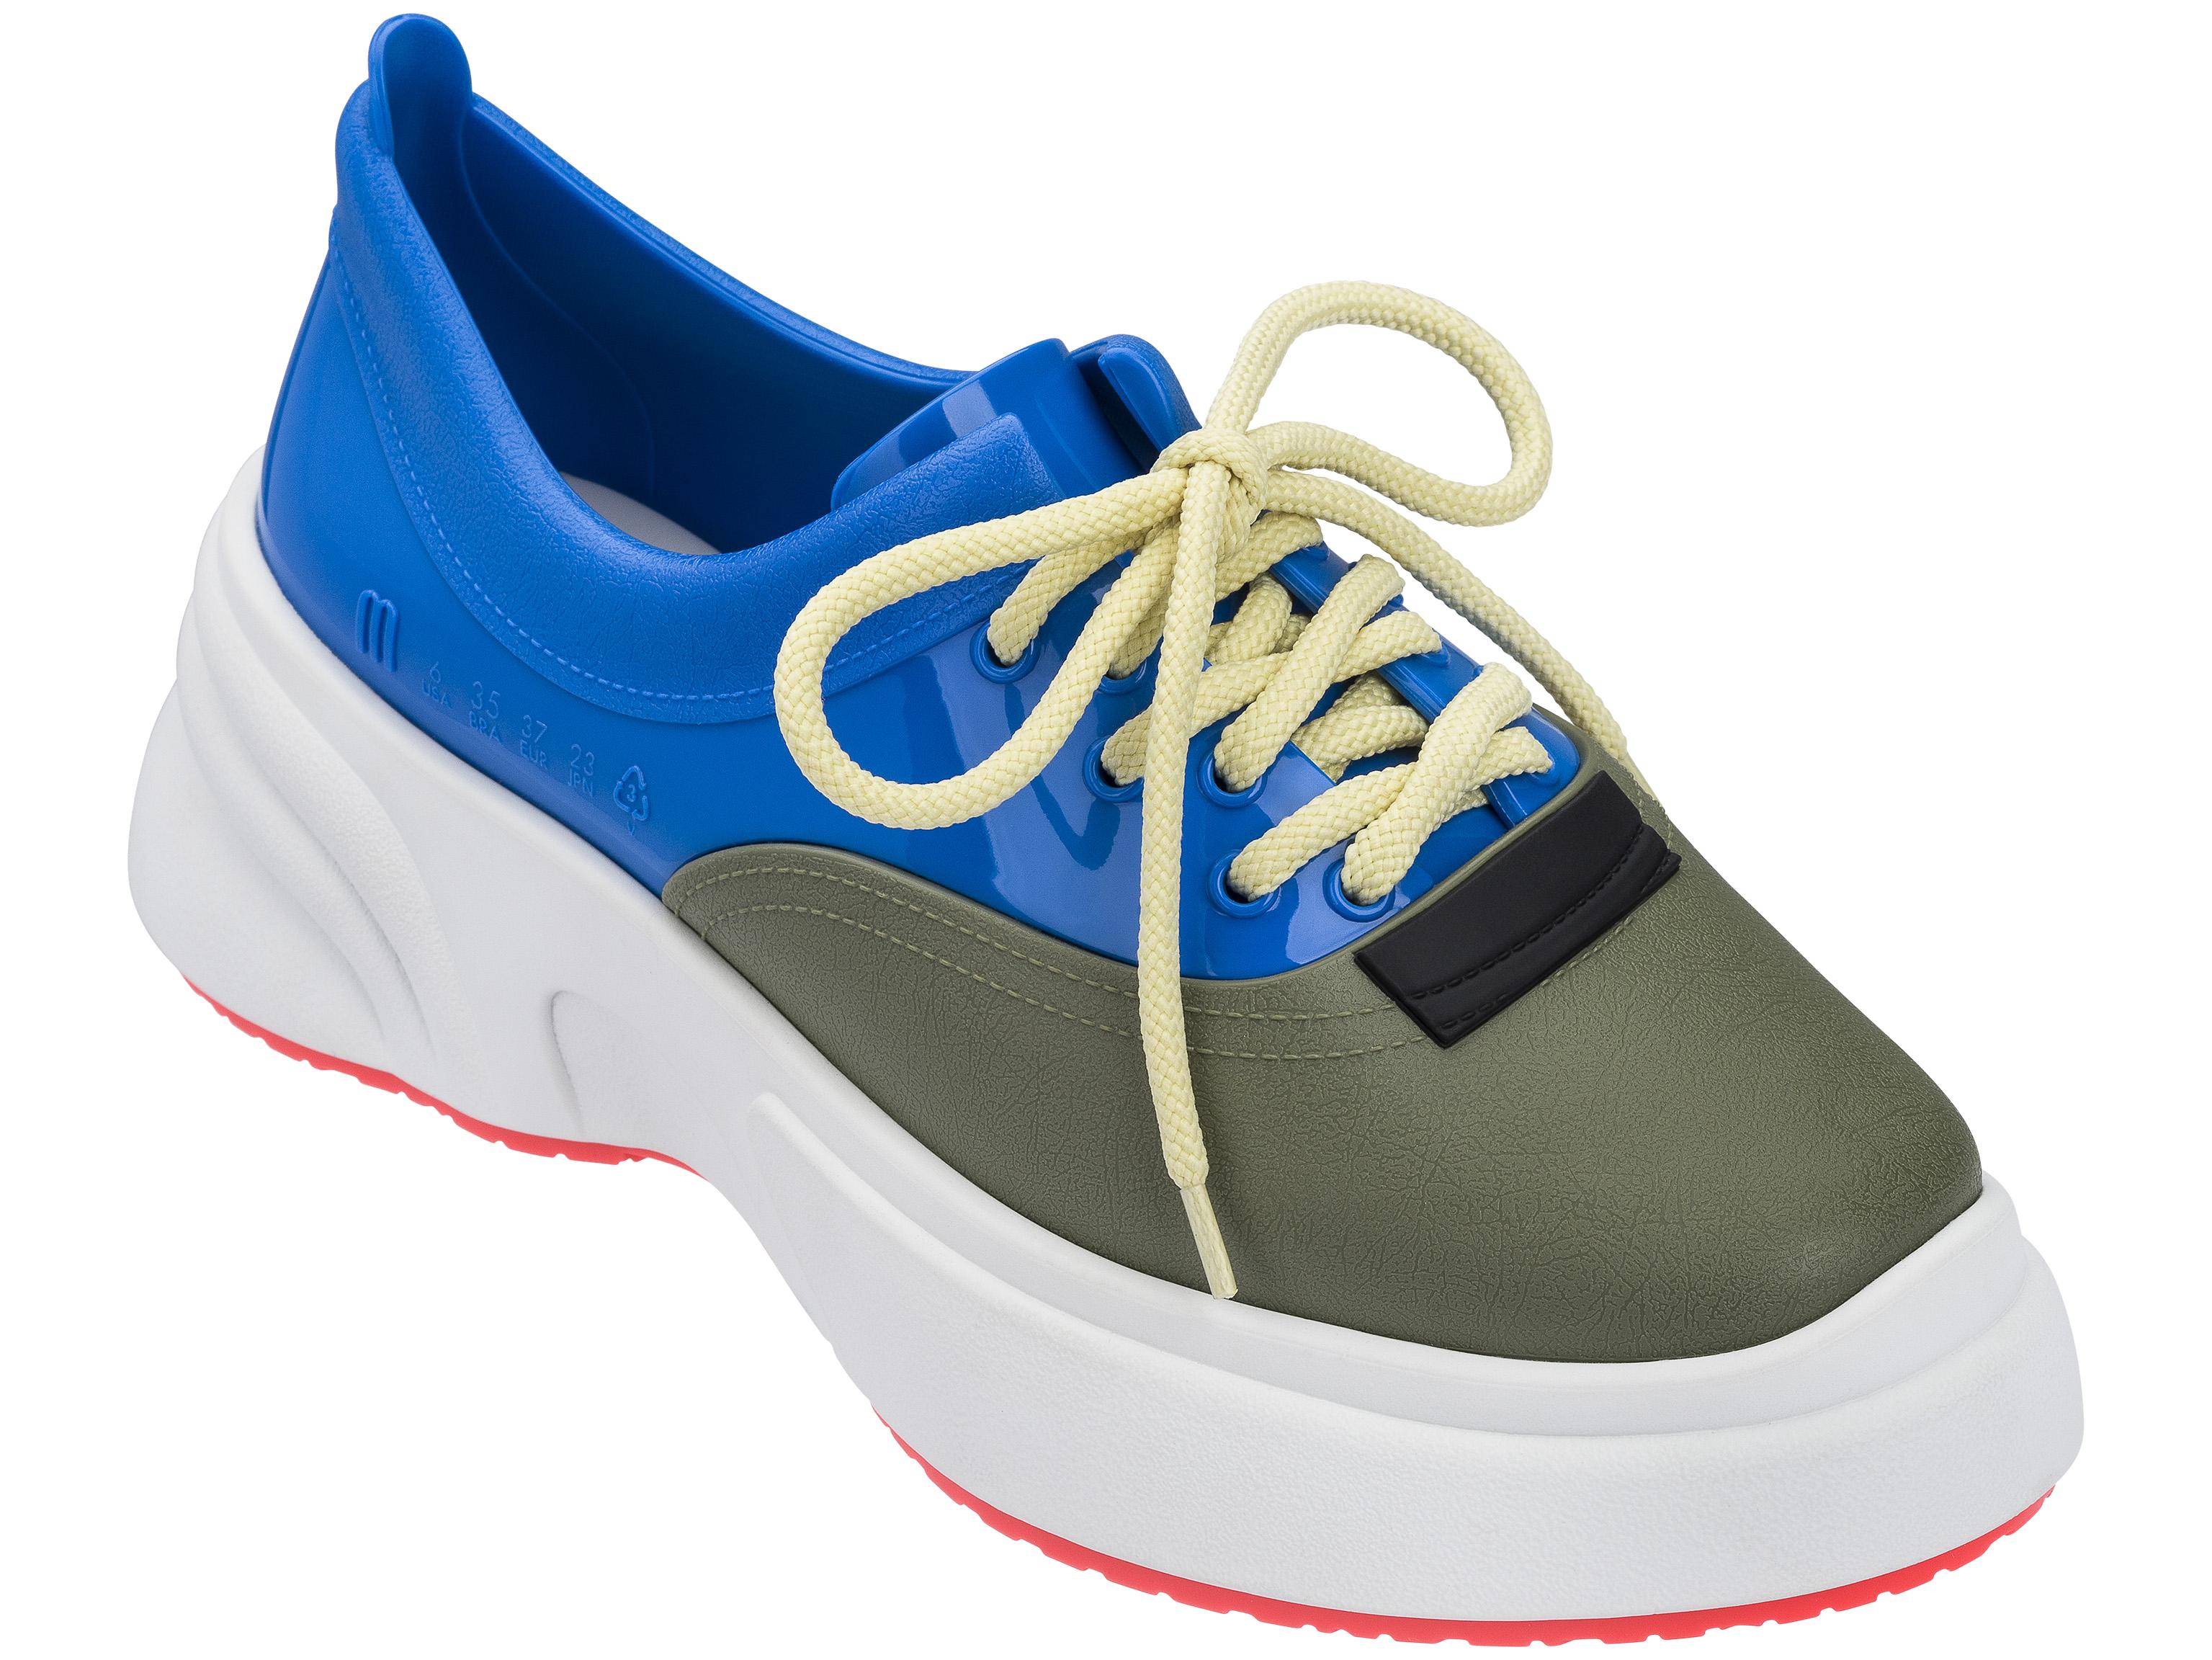 dad-sneaker-melissa-